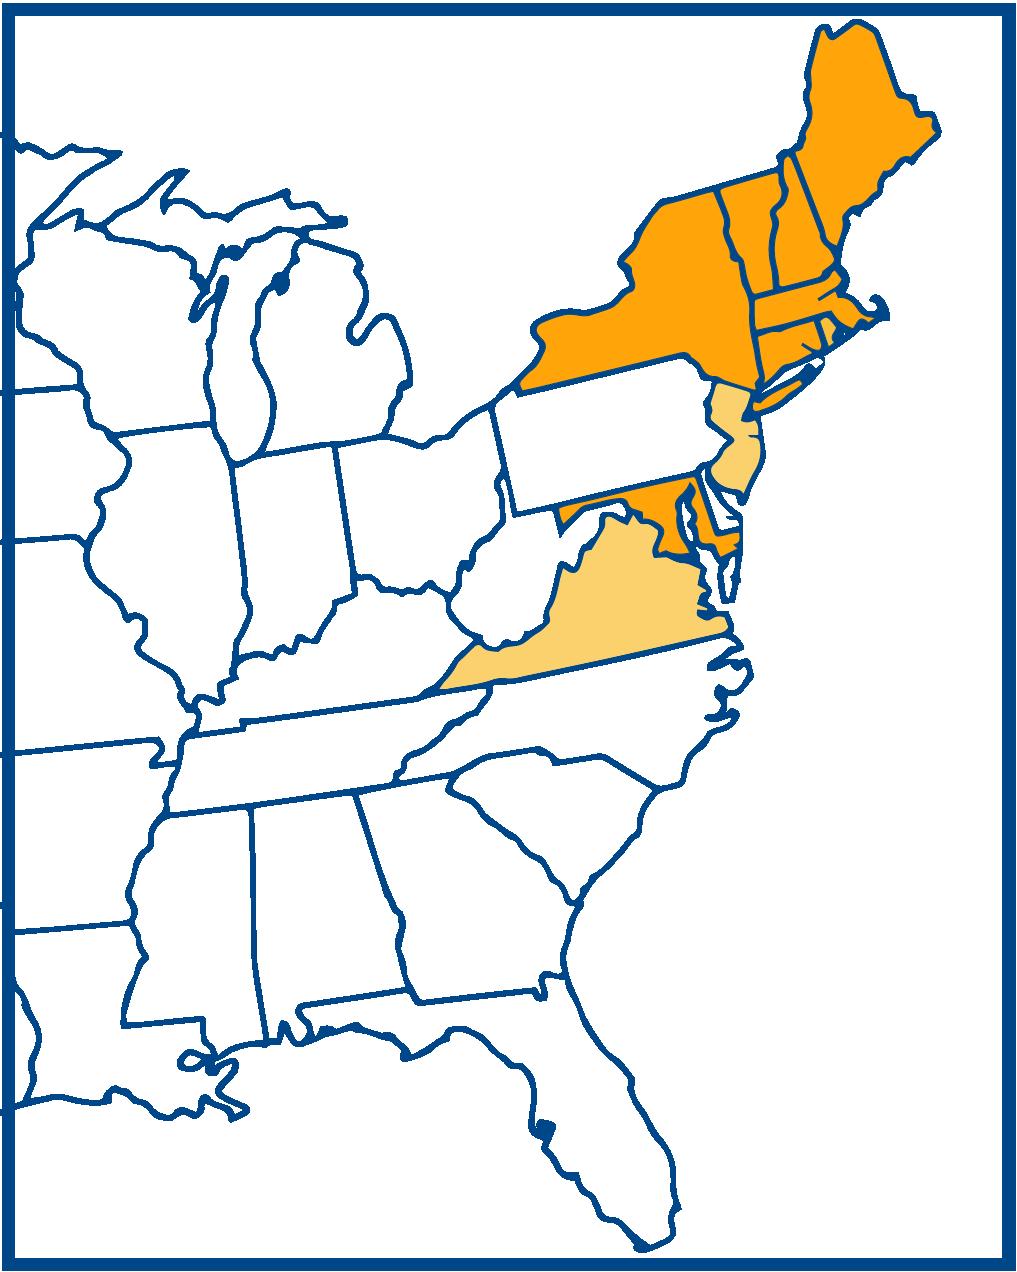 RGGI States Map-2_No background.png